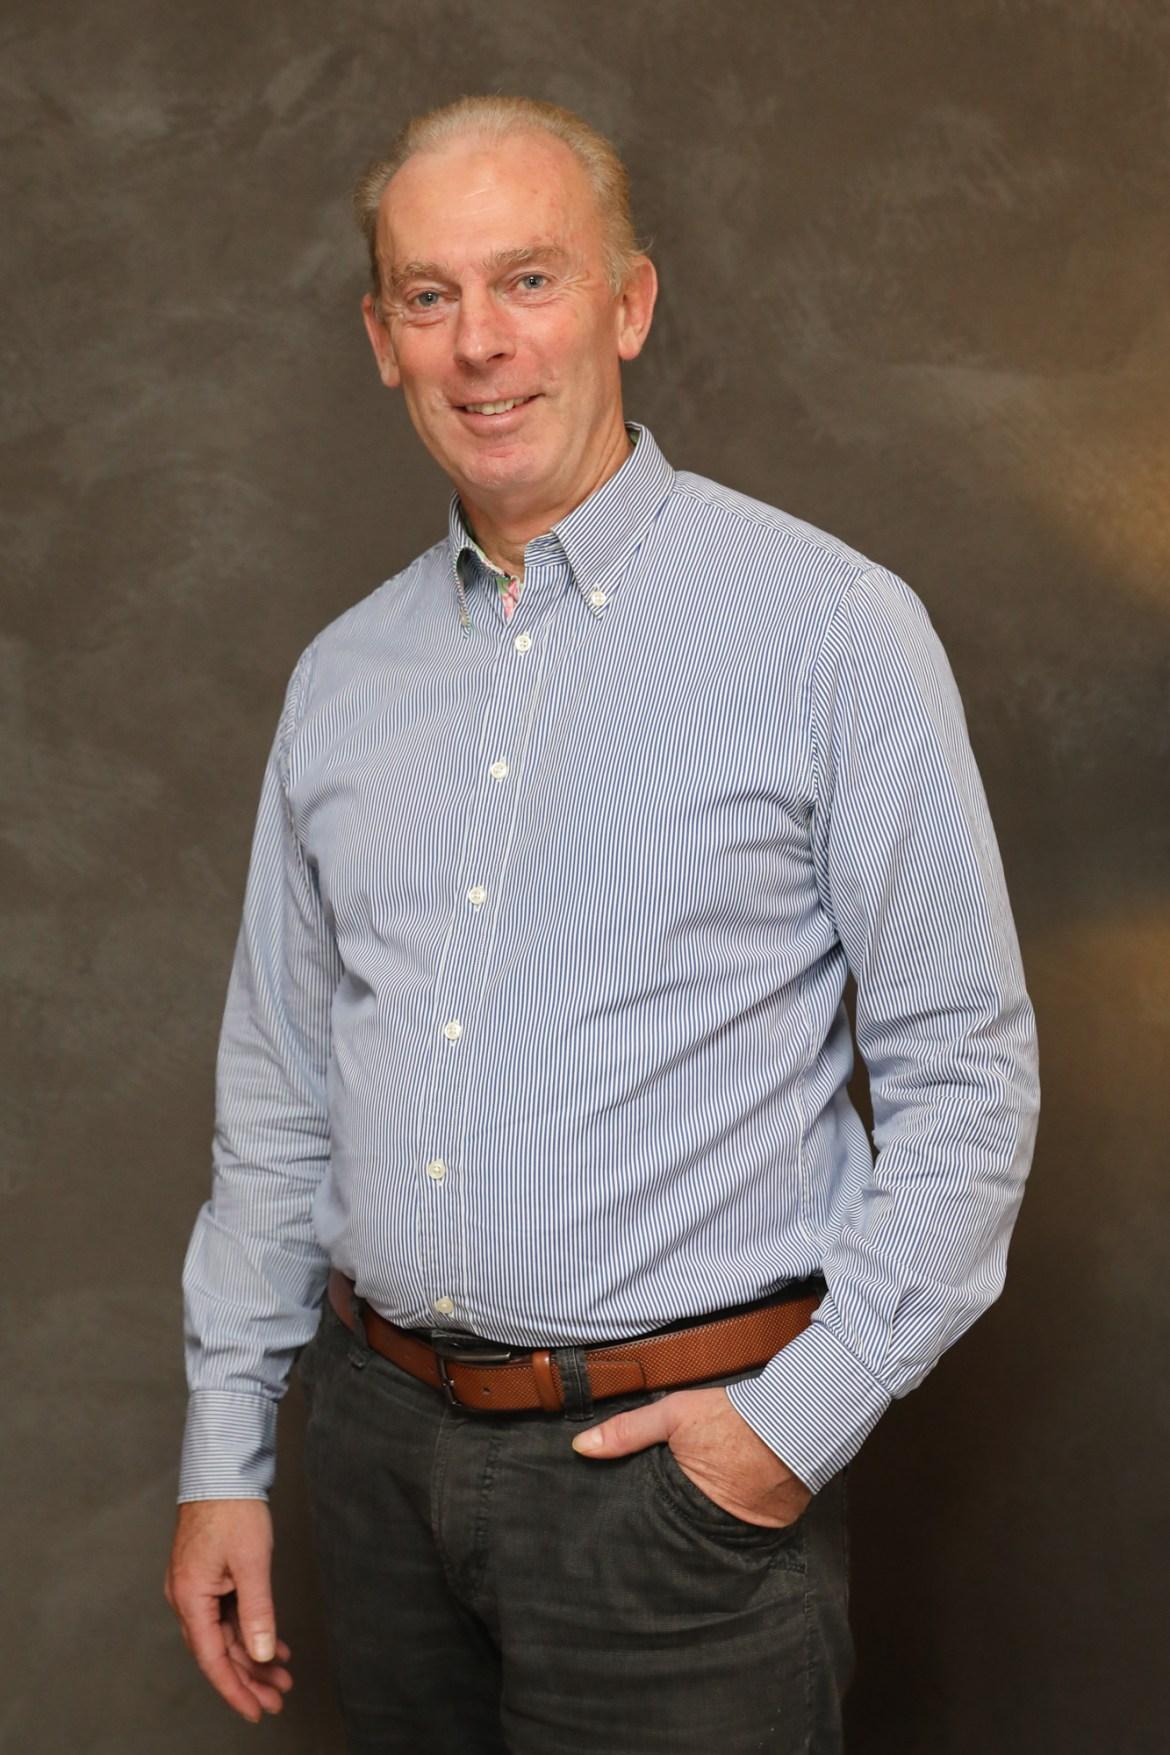 Geert Jan Douma